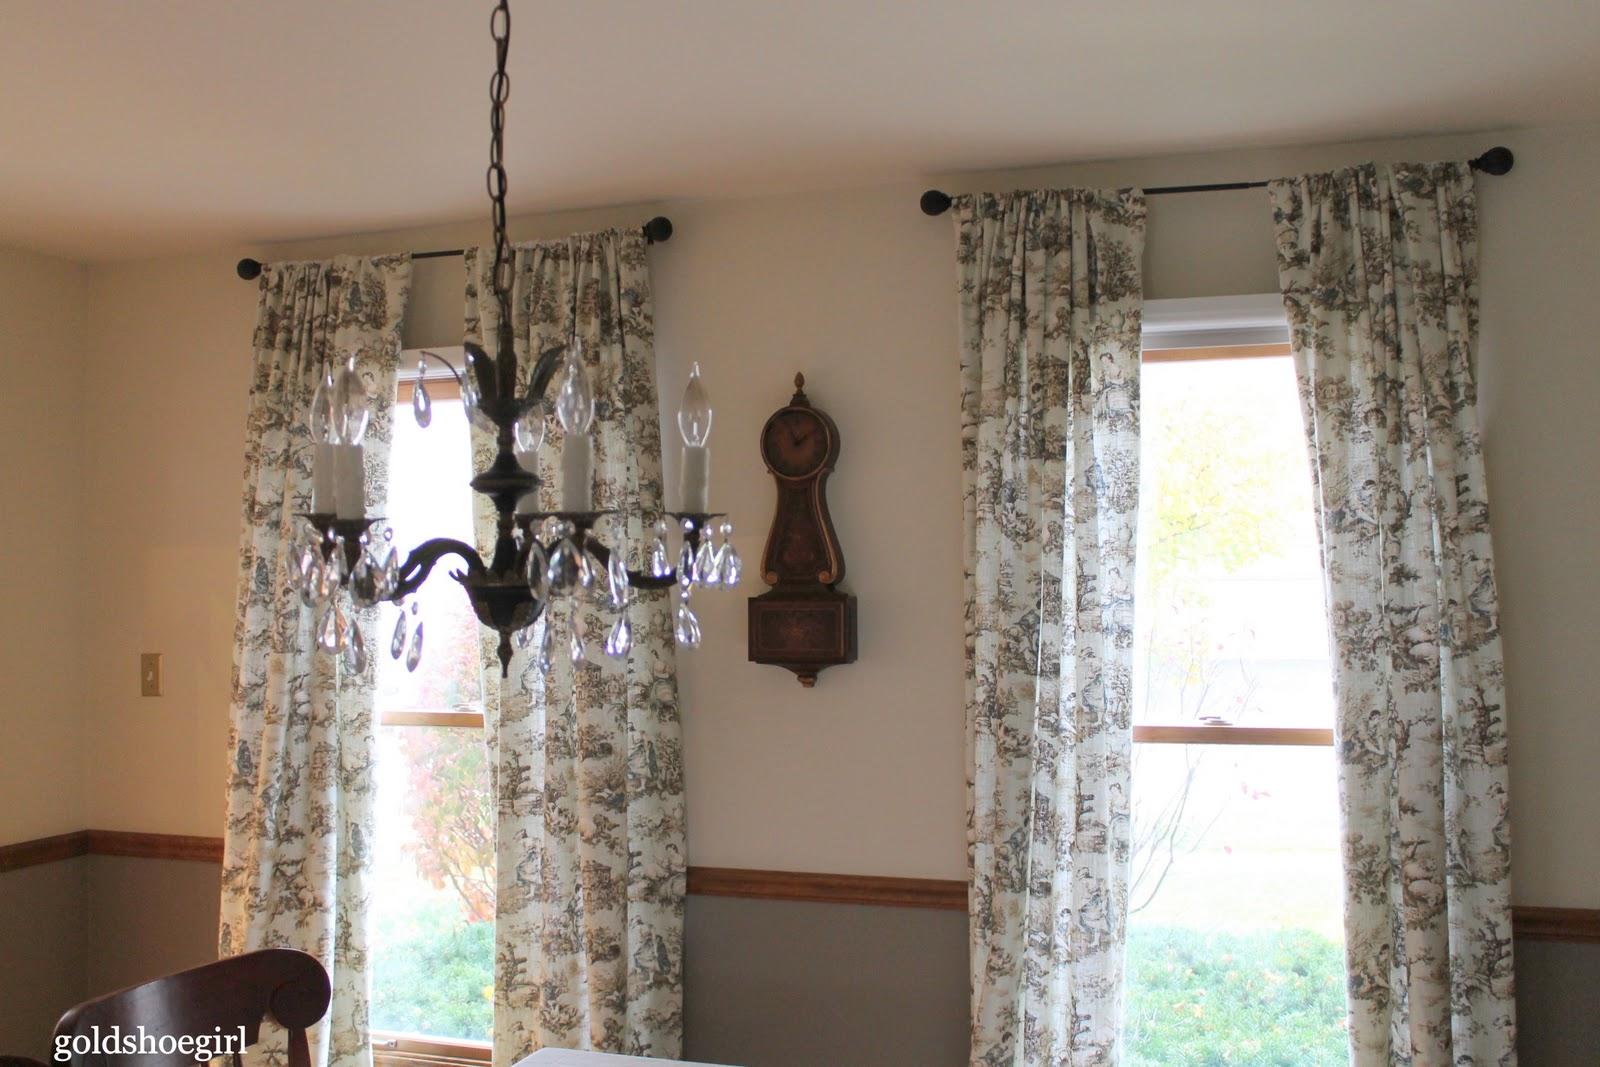 Ebay curtain rods